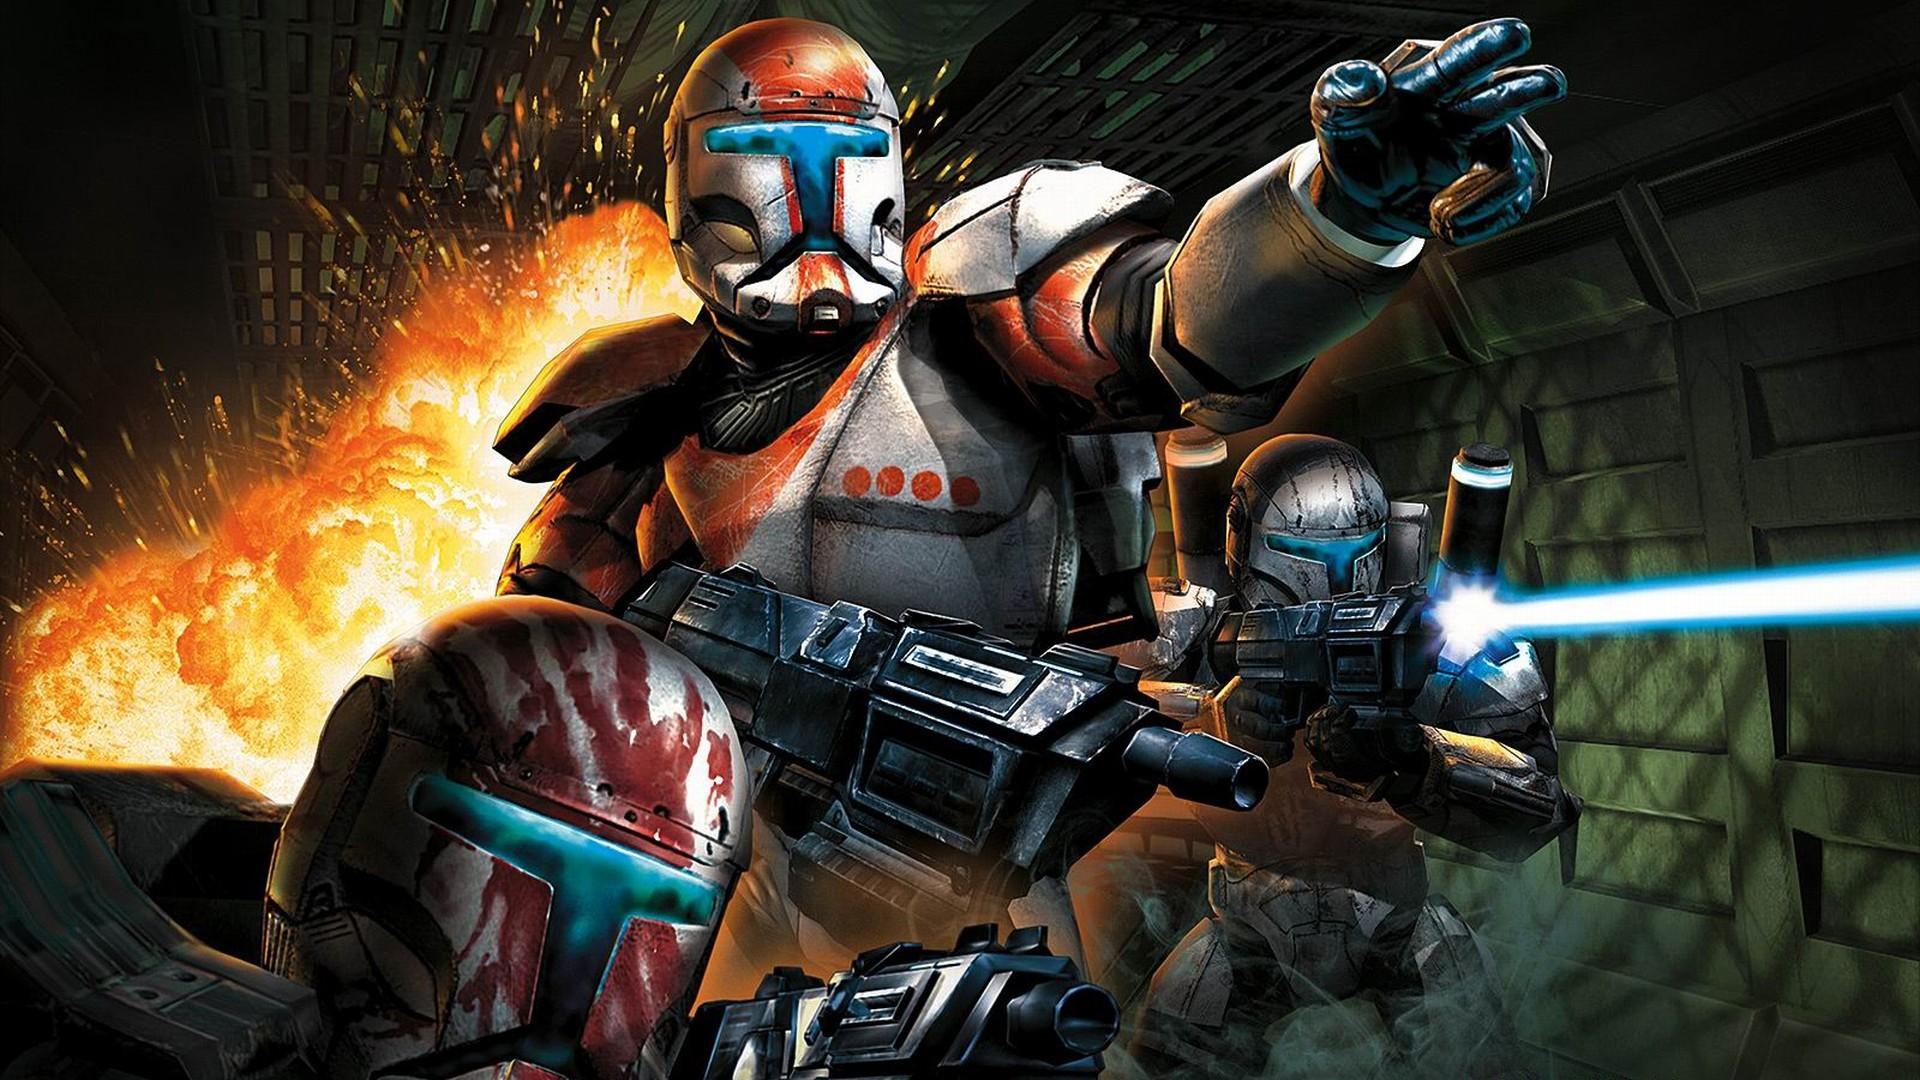 Похоже, шутер Star Wars: Republic Commando скоро выйдет на Nintendo Switch 1